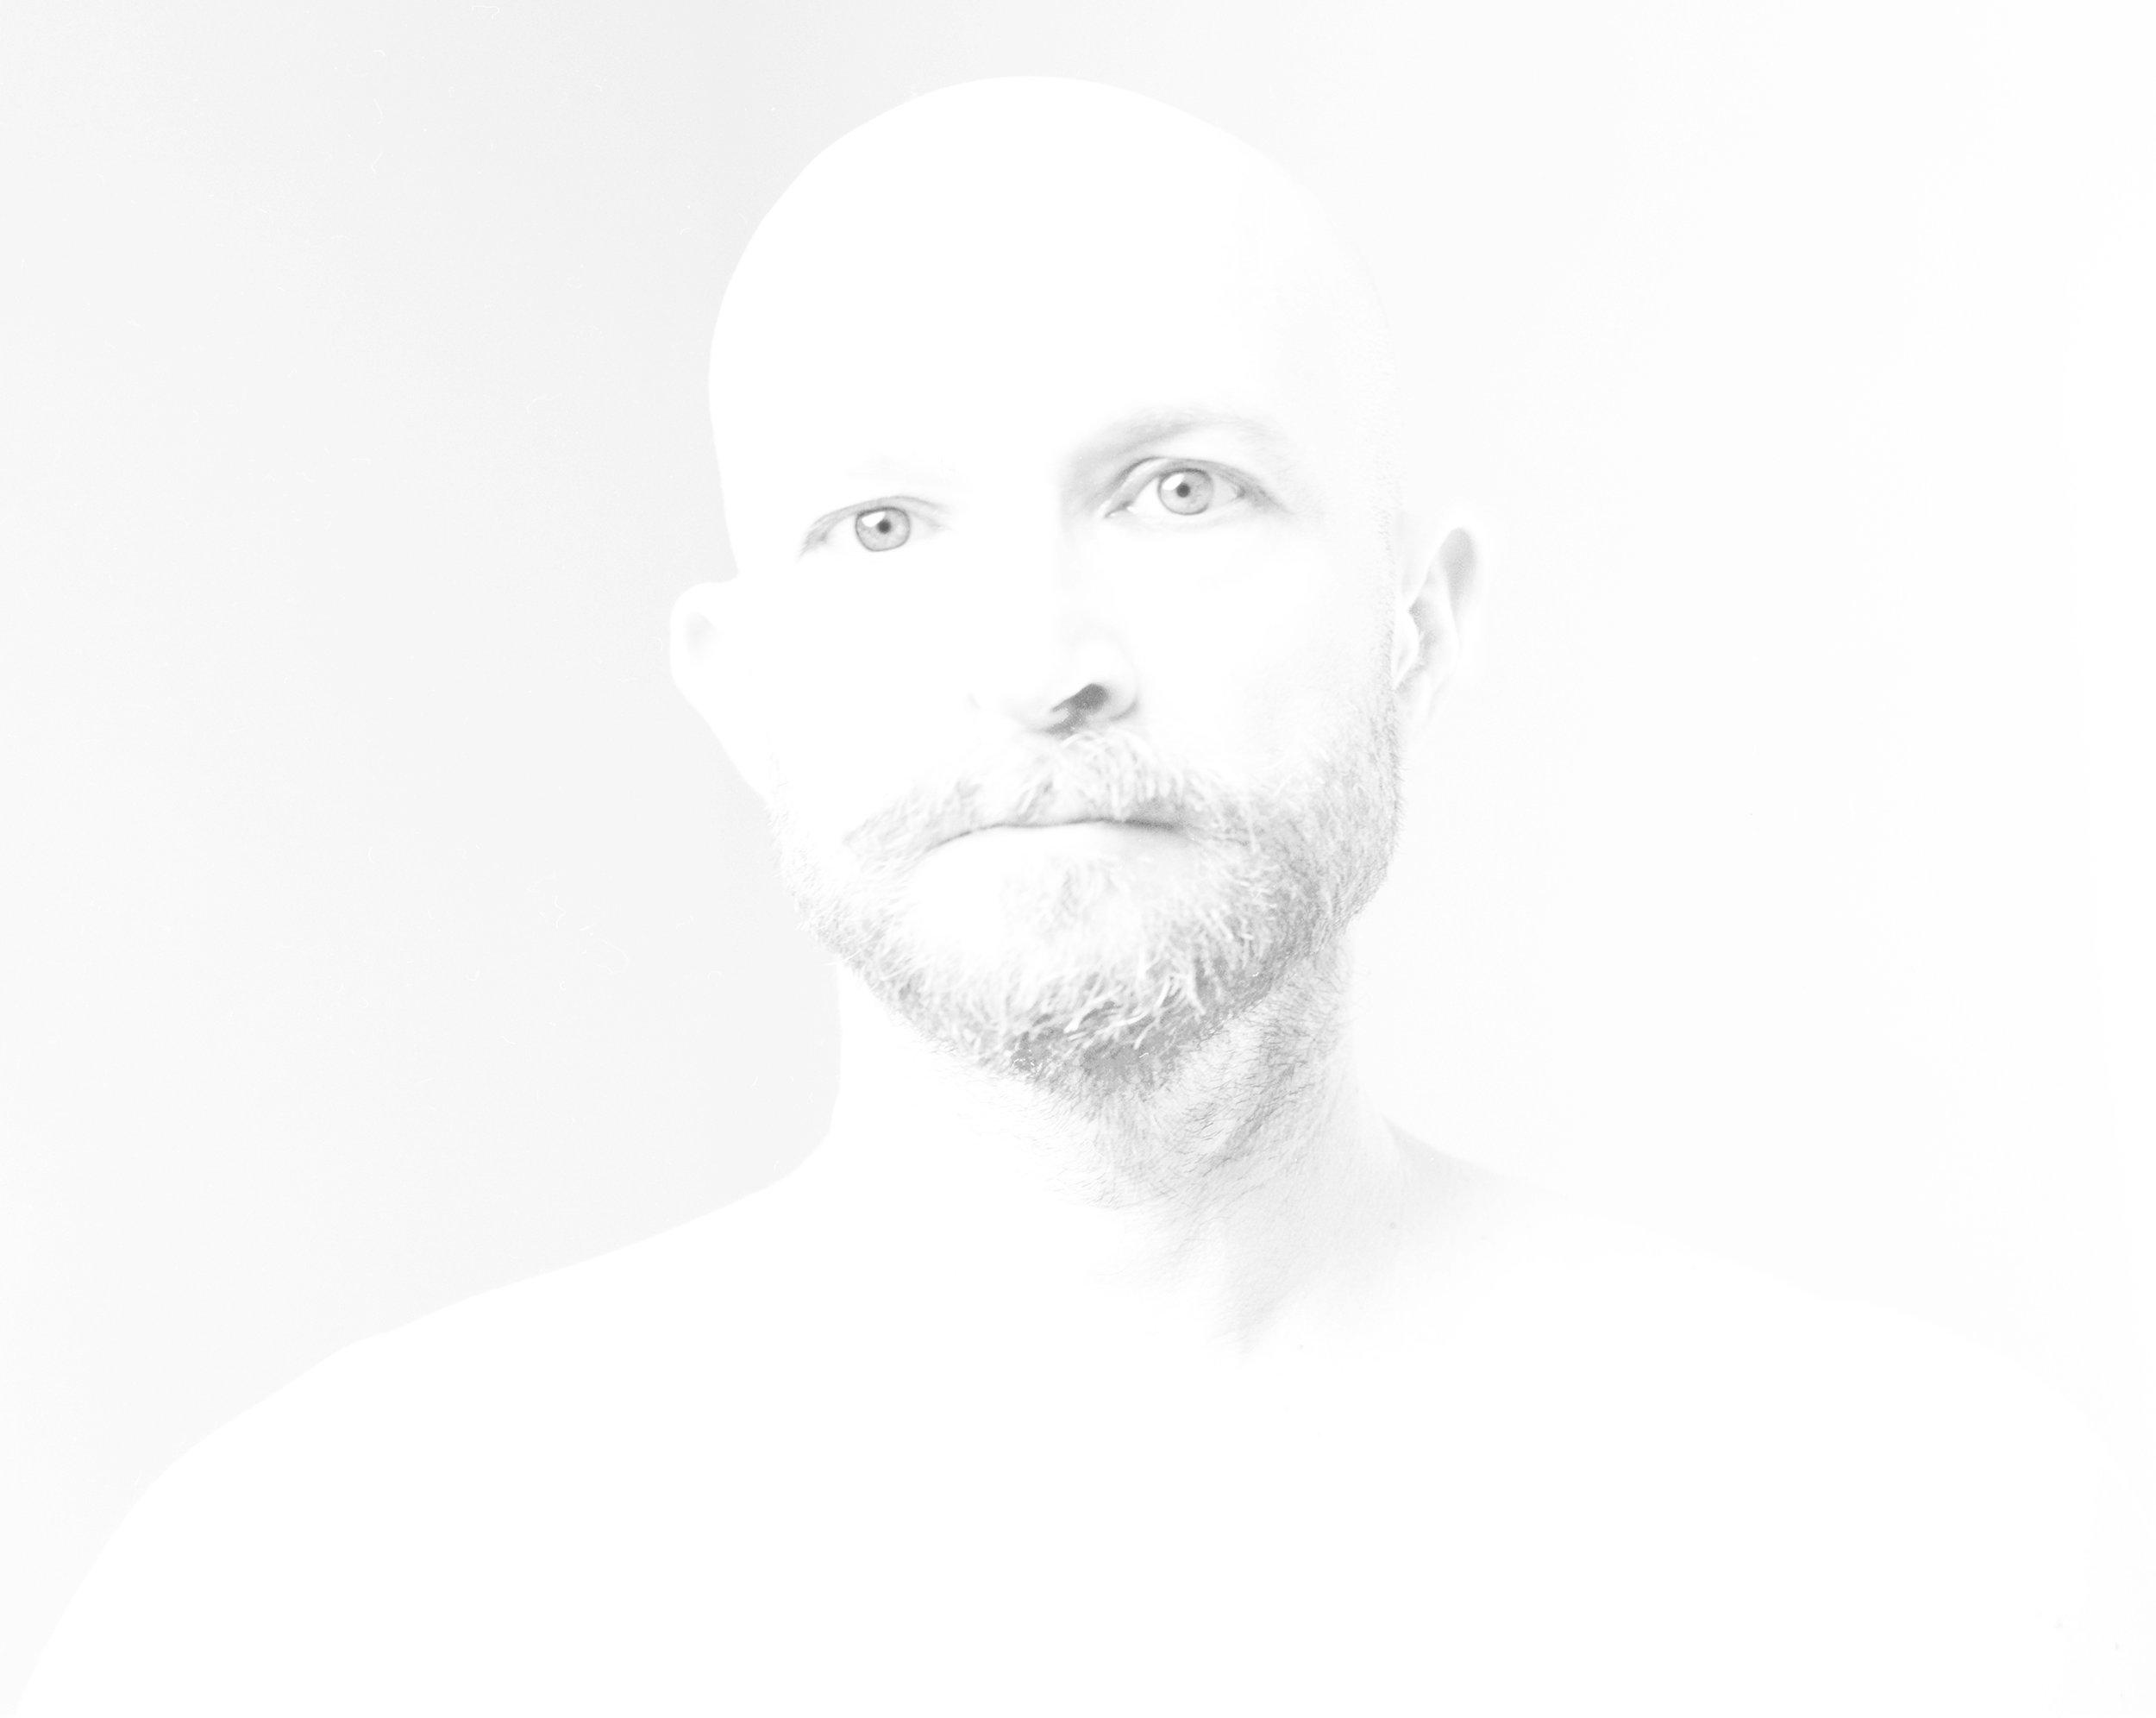 Self-Portrait, Matteo Marchisano-Adamo